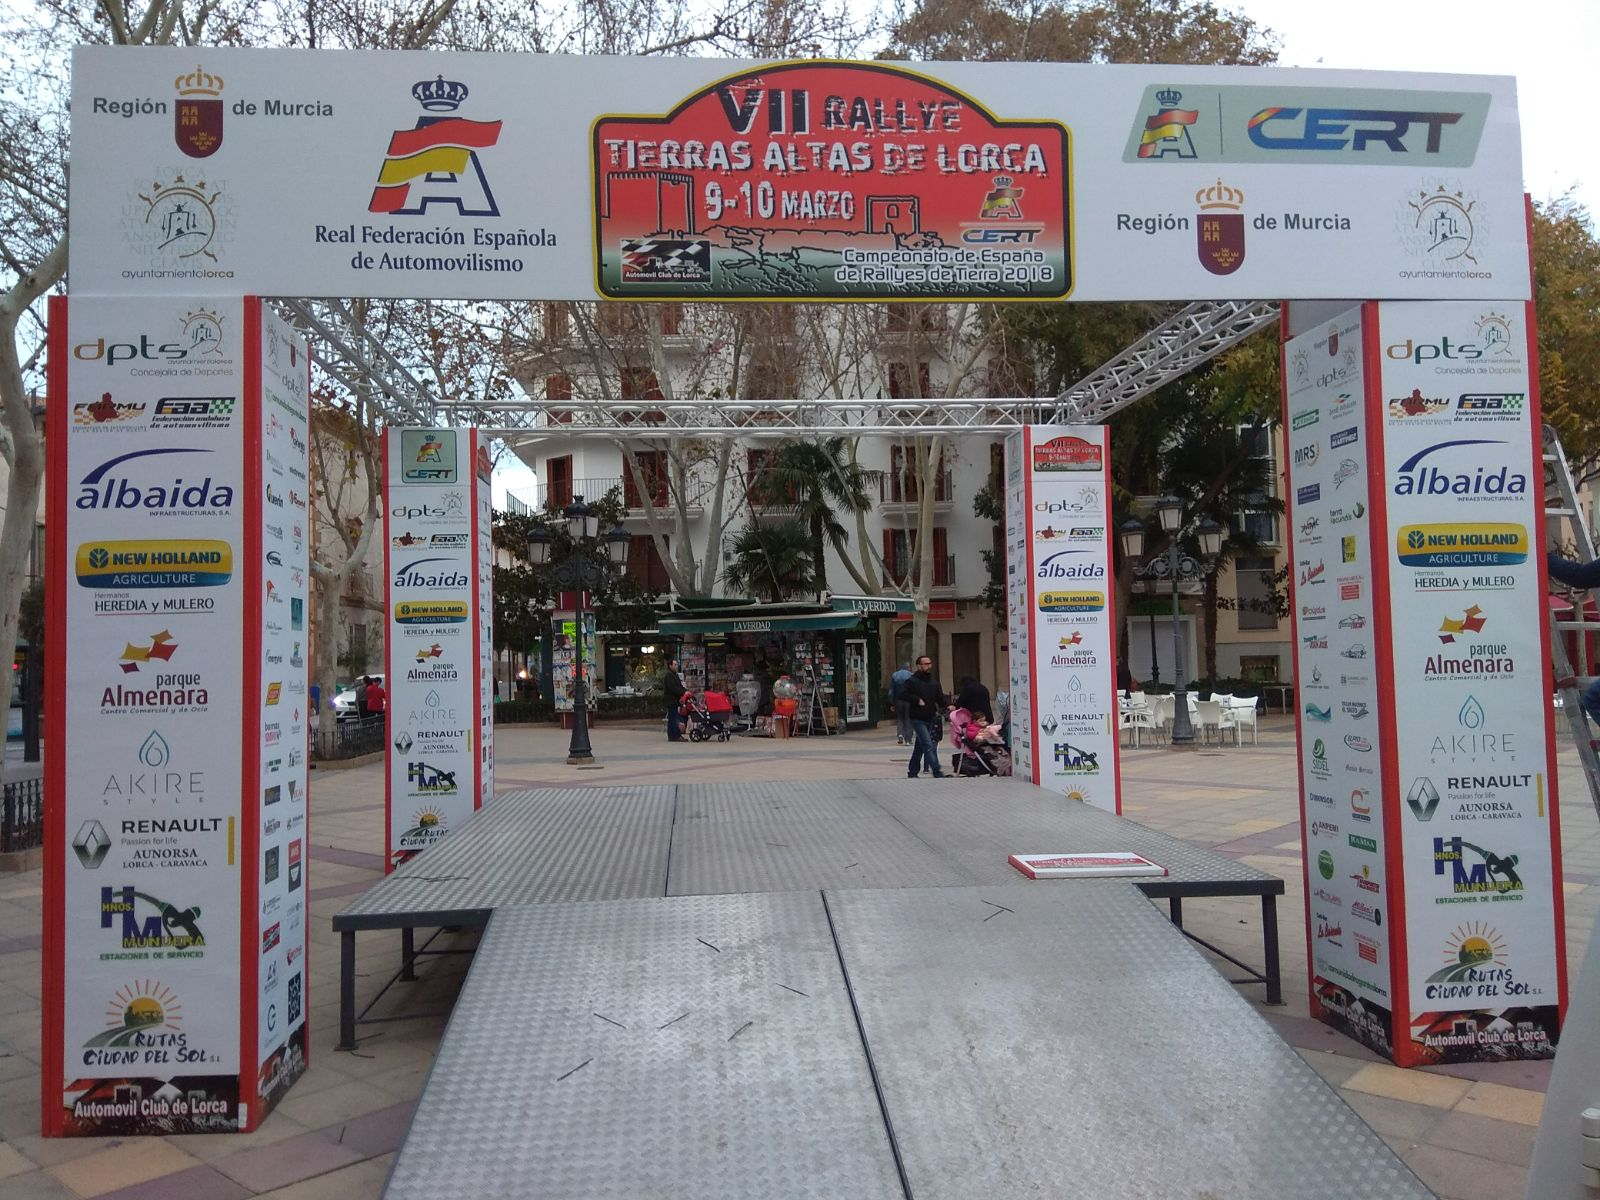 CERT: VII Rallye Tierras Altas de Lorca [9-10 Marzo] DXtDvz2WsAAV0M8